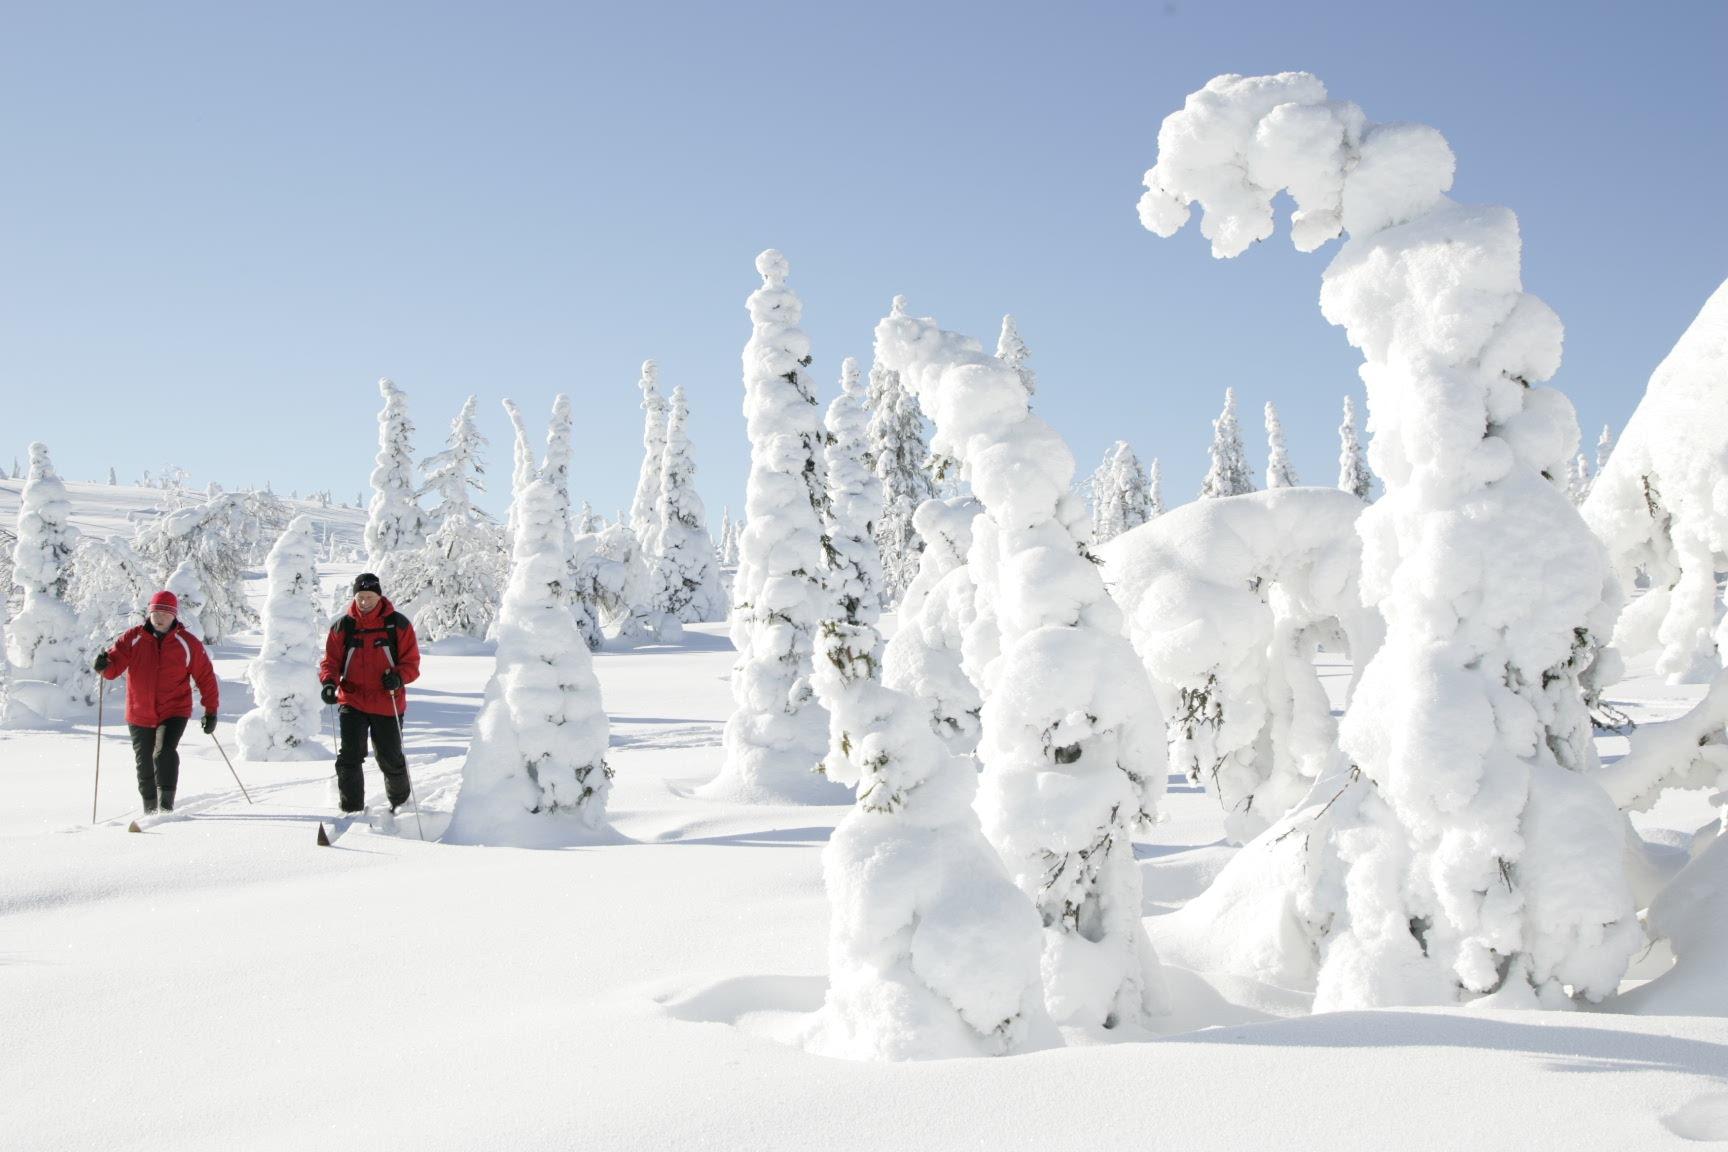 https://upload.wikimedia.org/wikipedia/commons/2/23/Skiing_at_Riisitunturi_National_Park.JPG